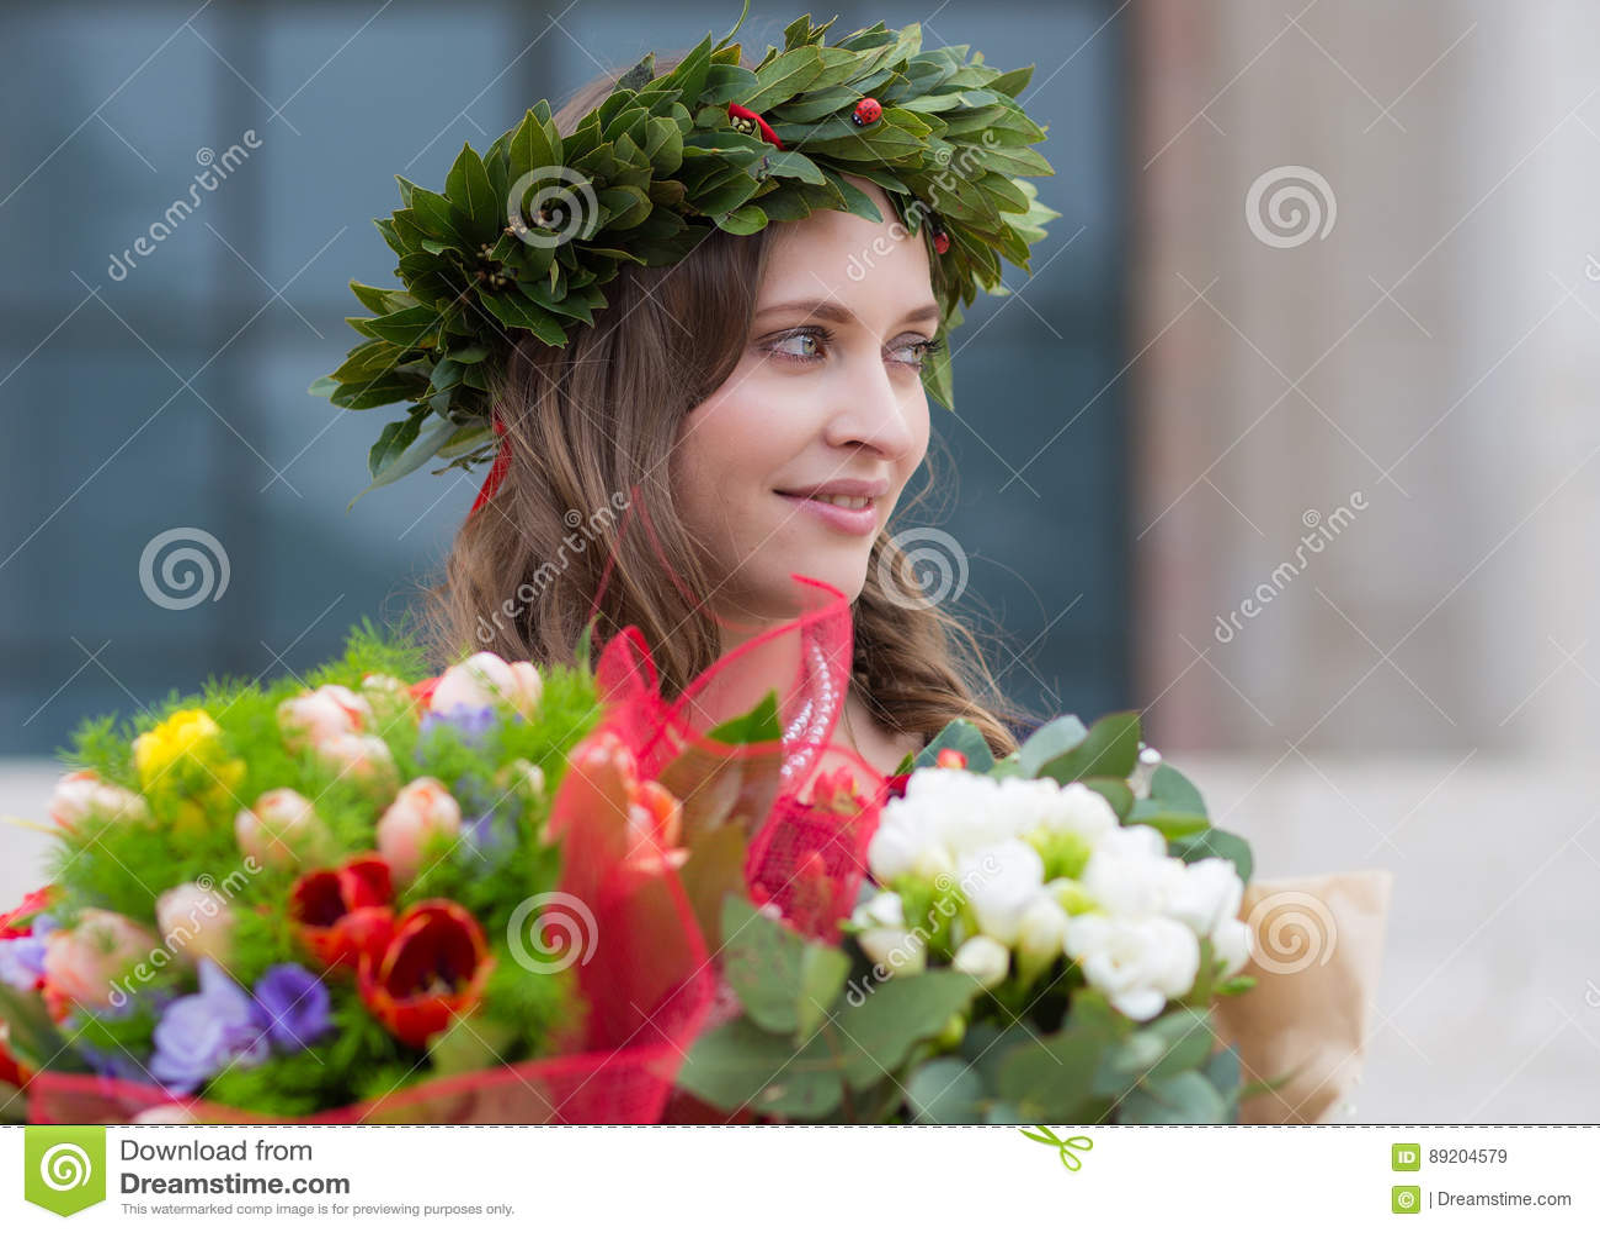 Beautiful girl with flowers graduated stock image image of beautiful girl with flowers graduated izmirmasajfo